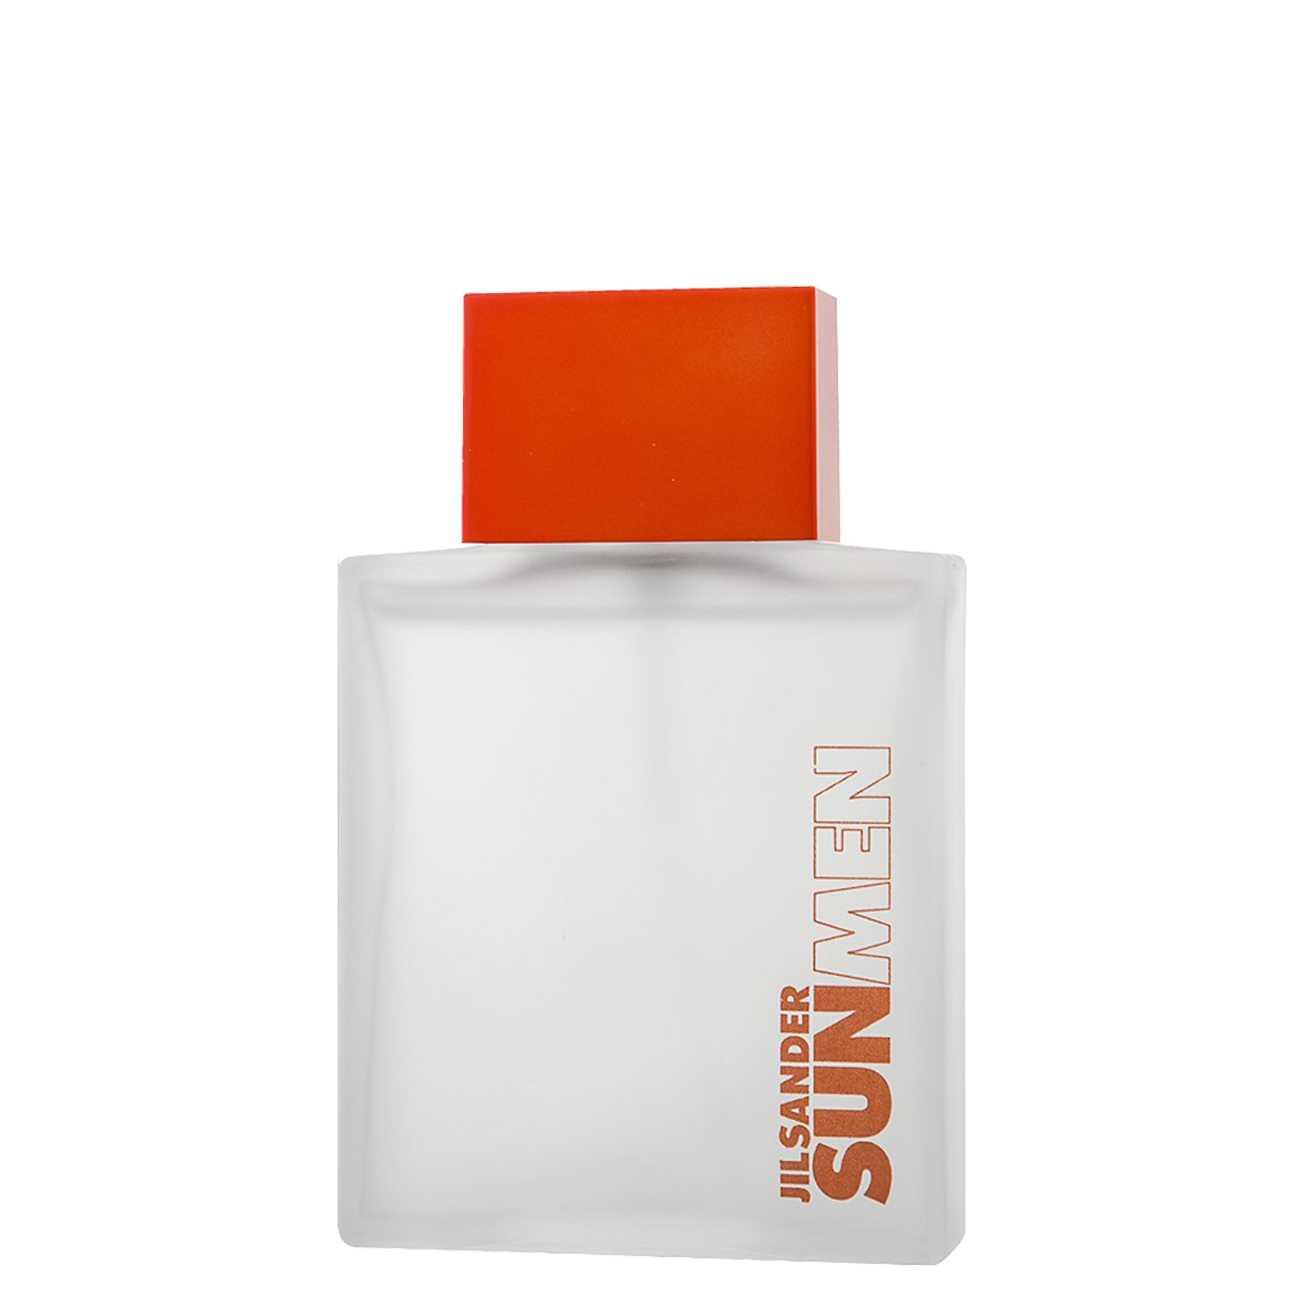 SUN MEN 75 ML 75ml imagine produs